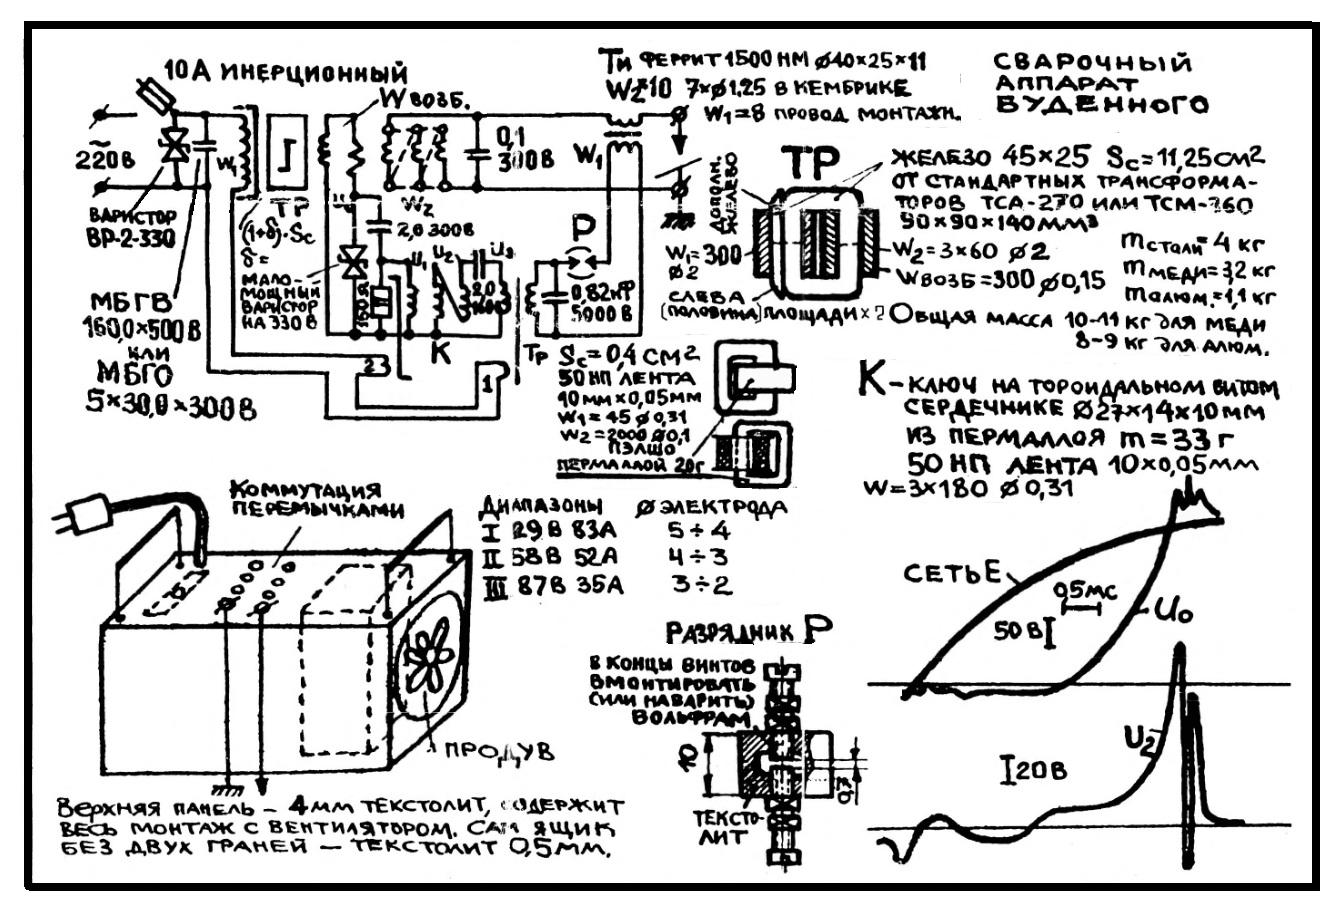 схема описание генератор капанадзе